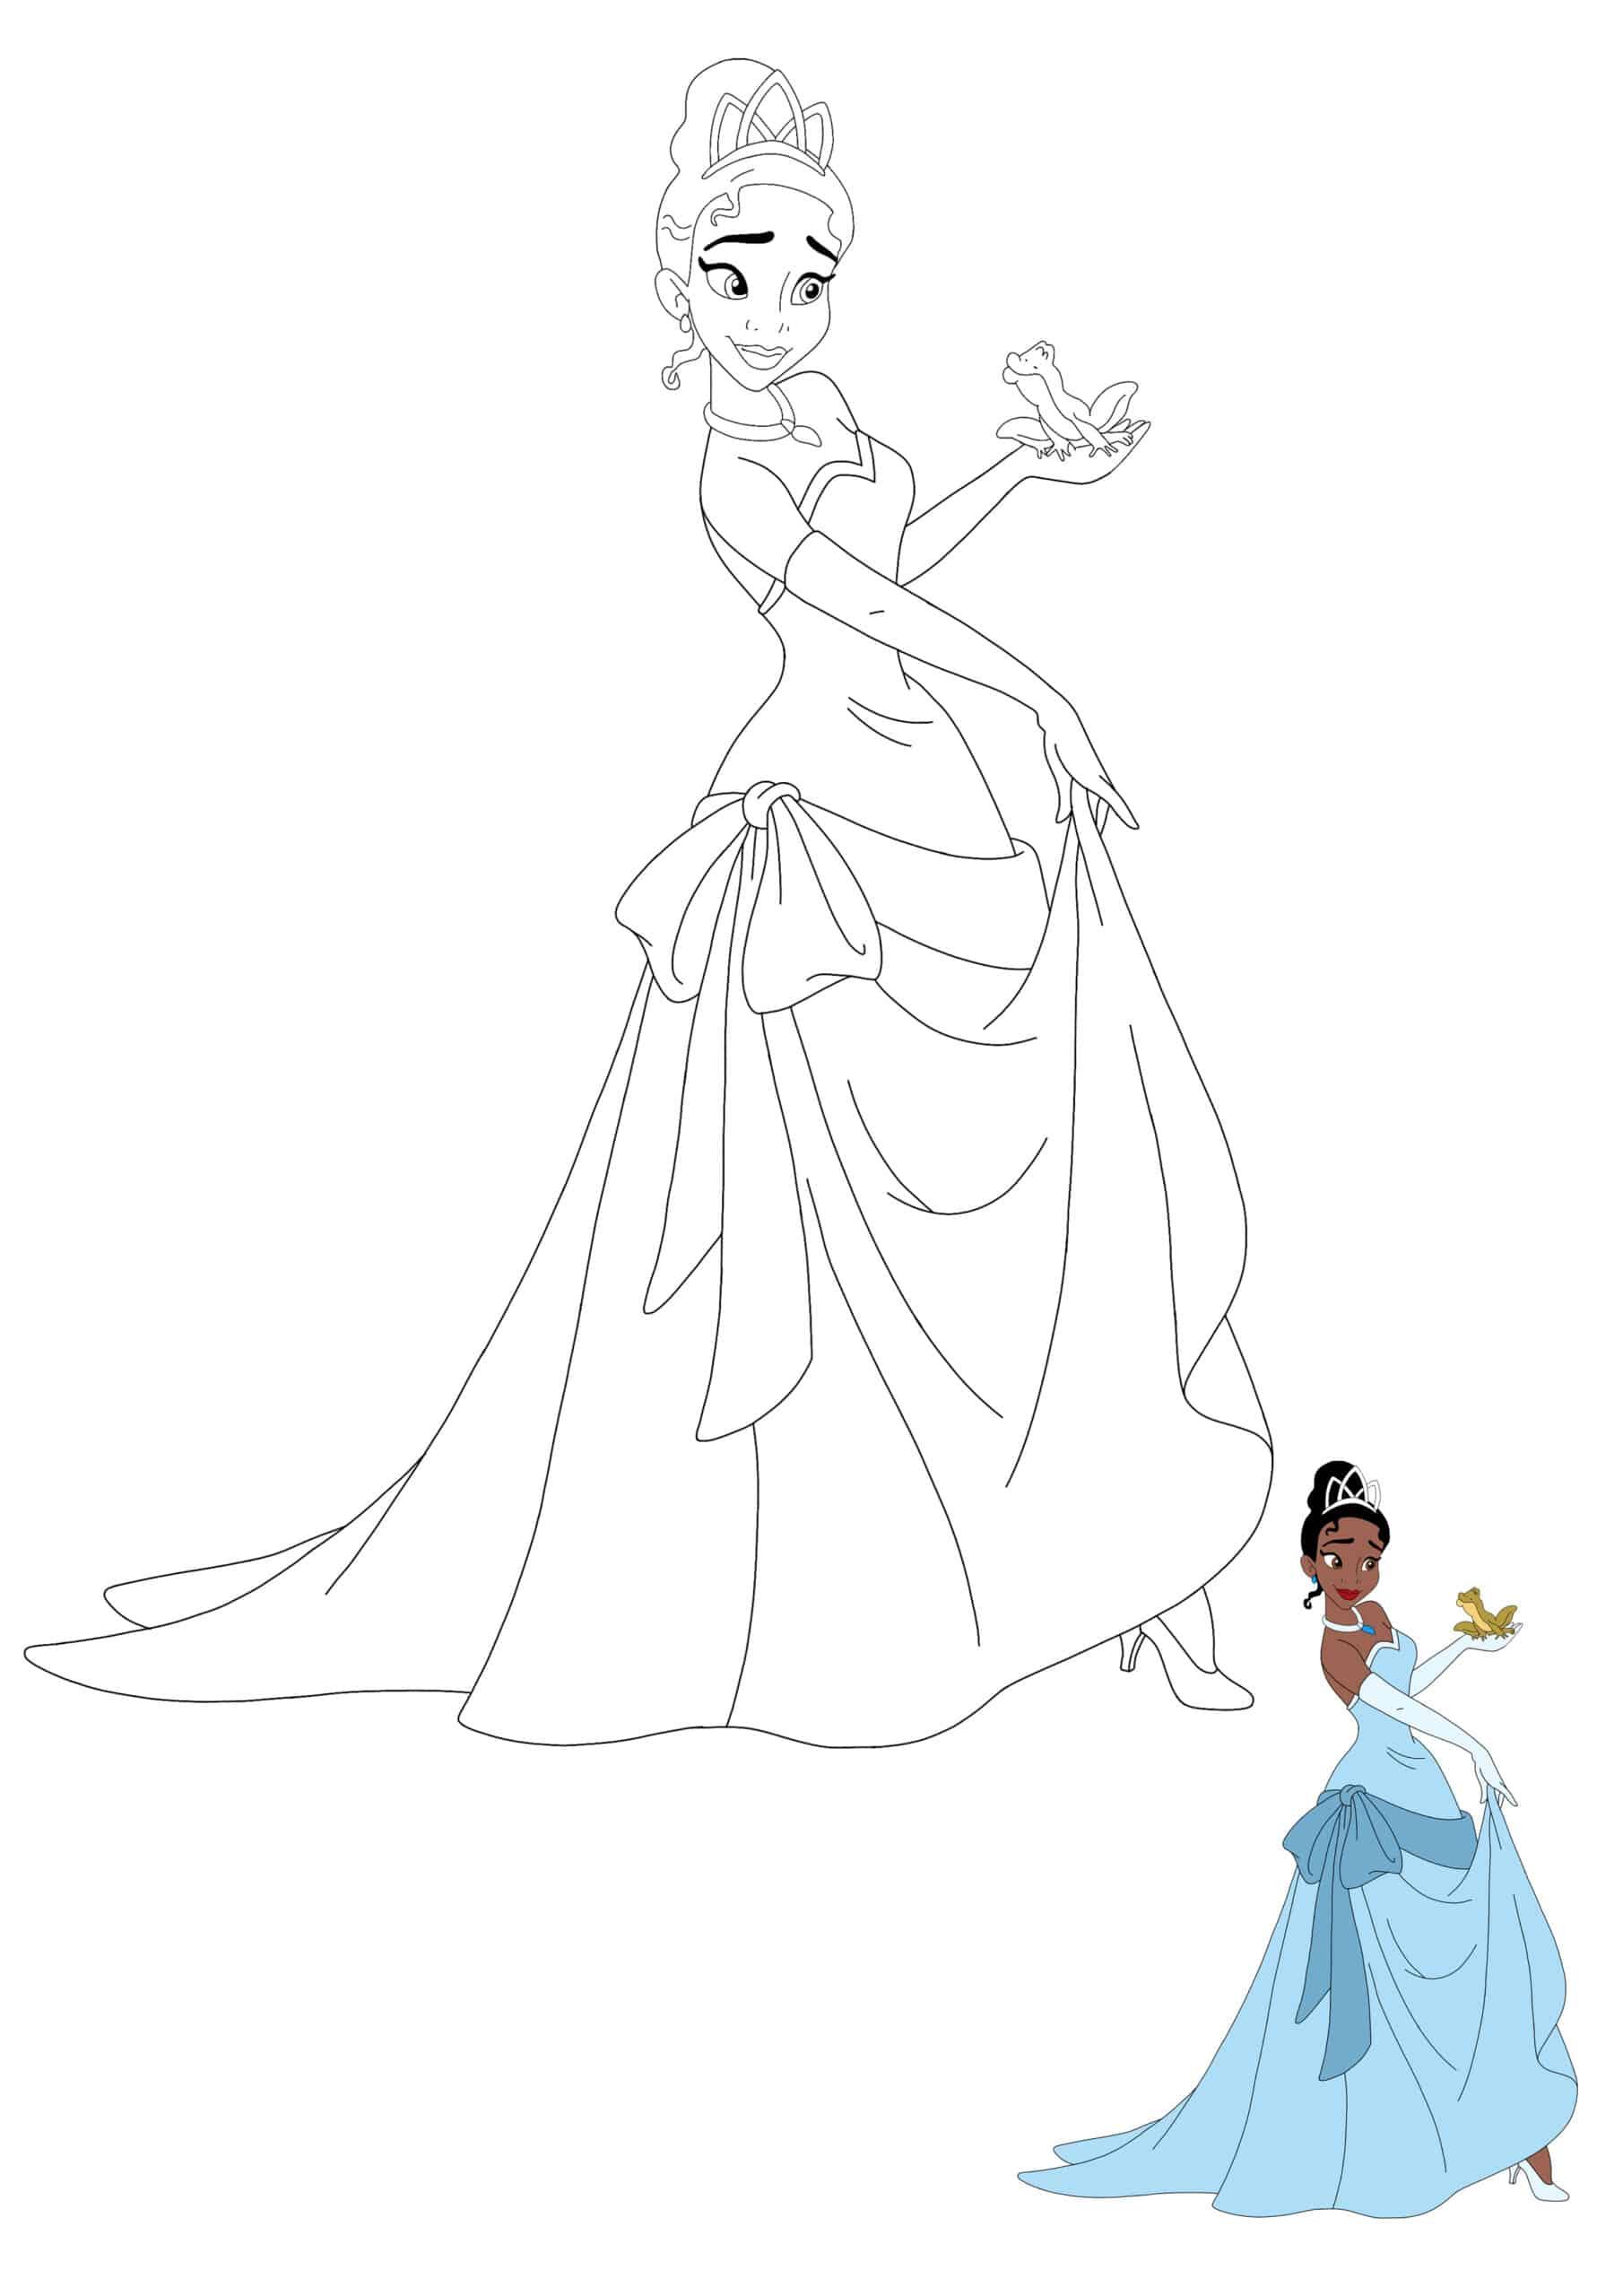 Princess Tiana And Prince Naveen As a Frog colouring page